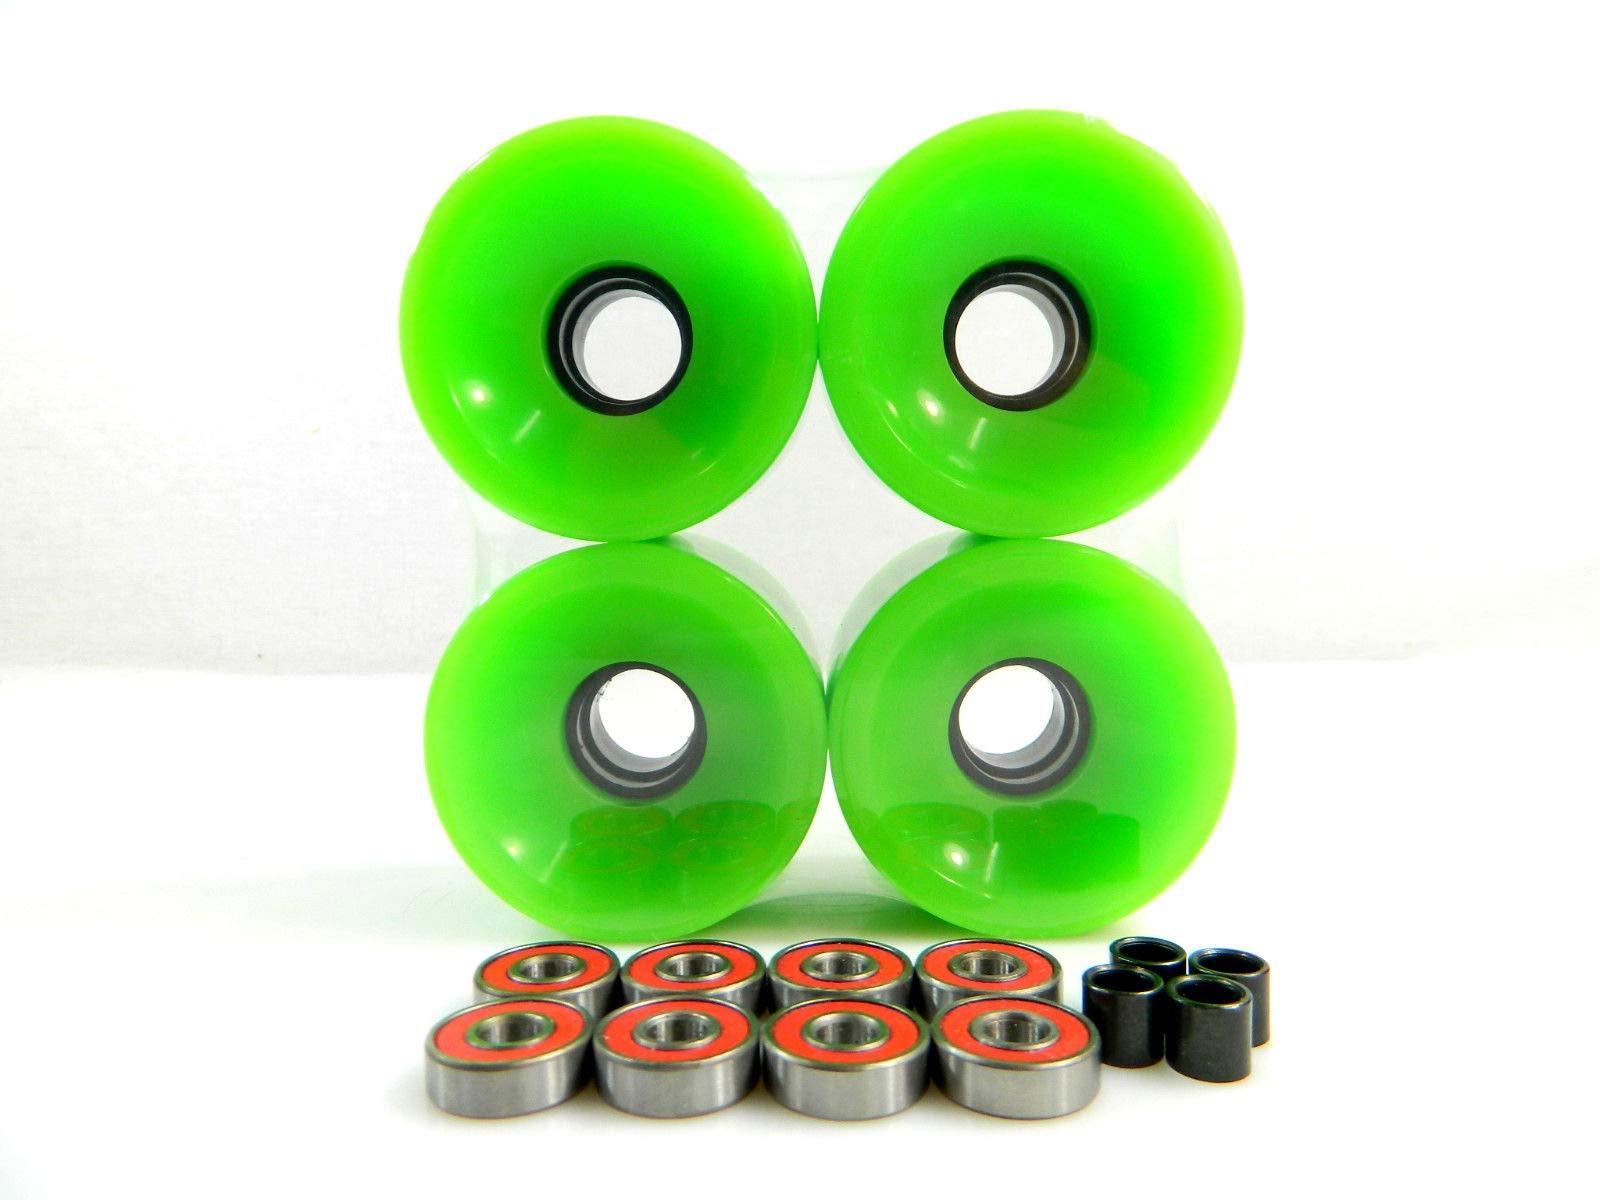 Good Skateboard Green Blank 70Mm Longboard Cruiser Wheels + ABEC 7 Bearing + Spacers